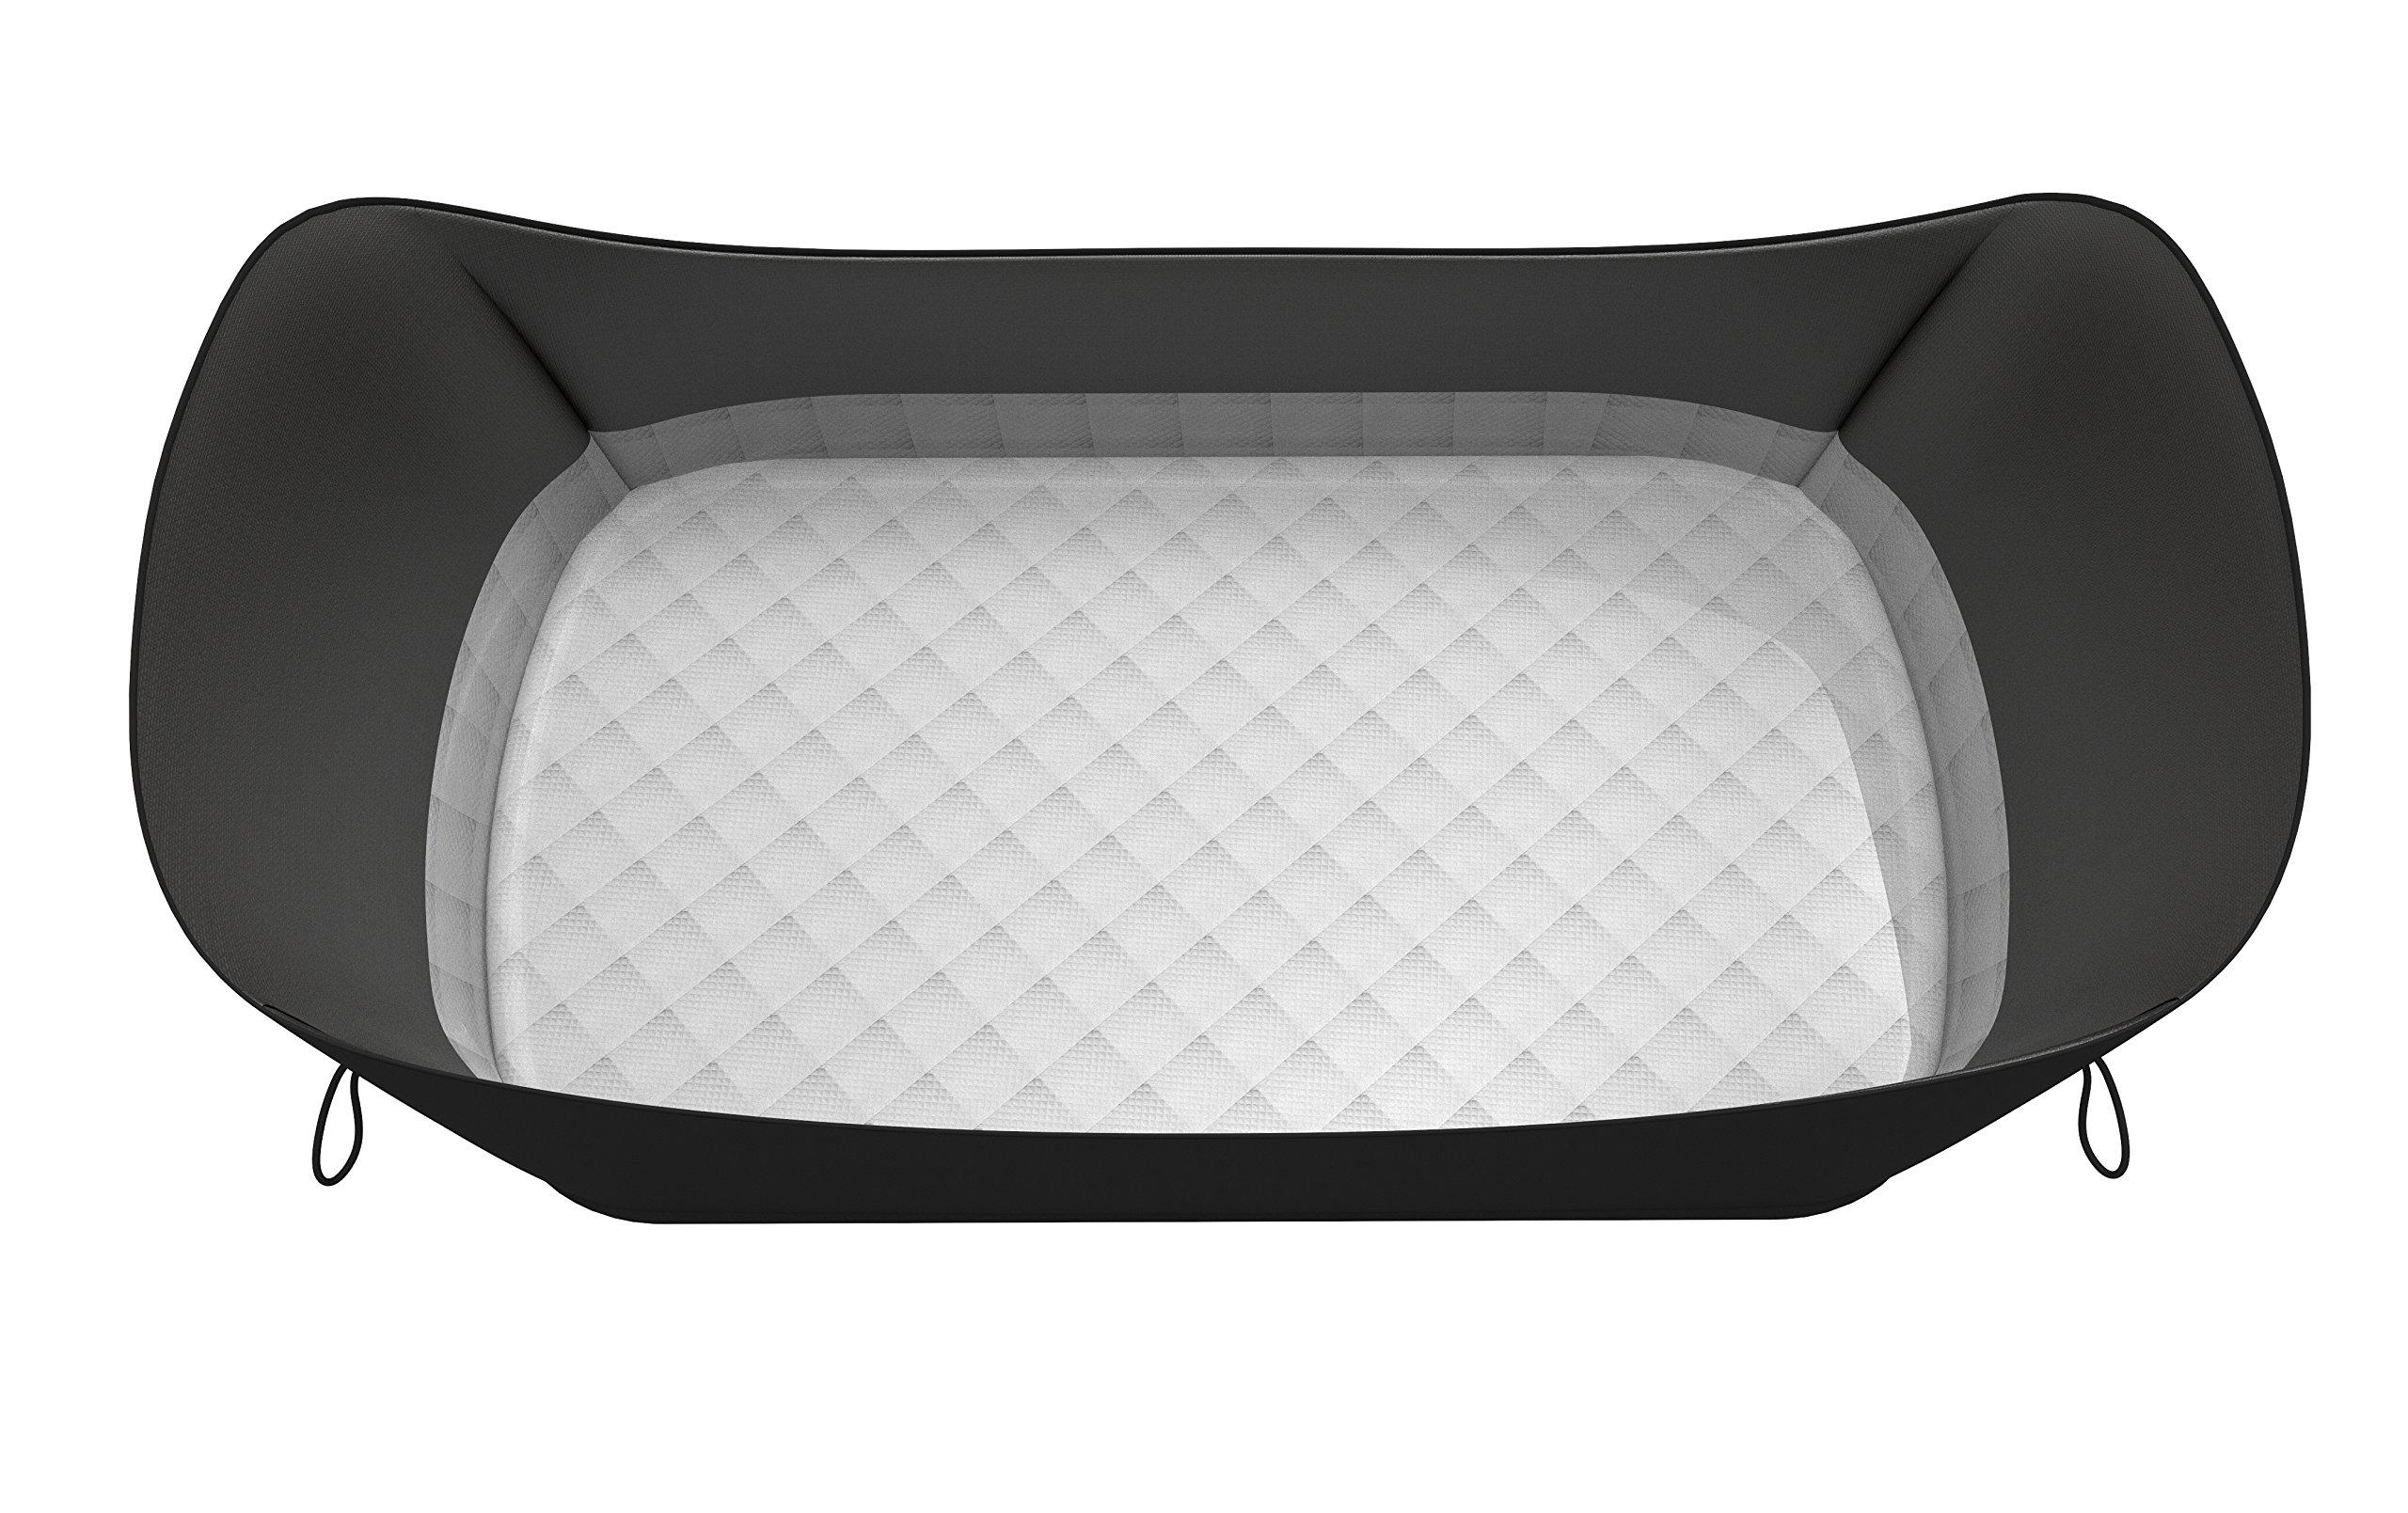 Nap System for Veer Cruiser